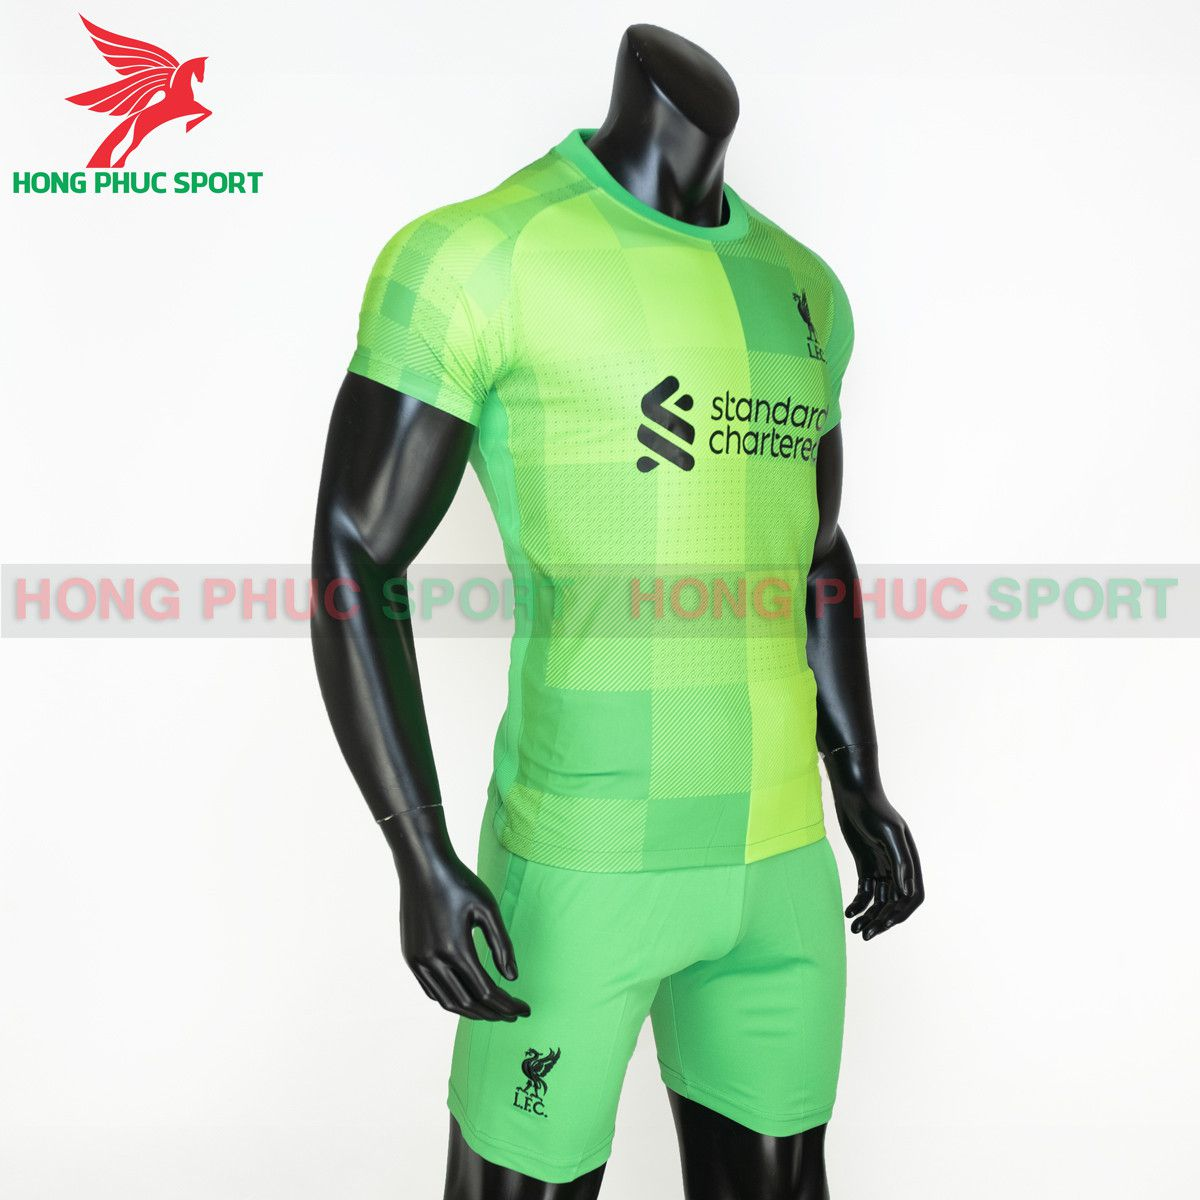 https://cdn.hongphucsport.com/unsafe/s4.shopbay.vn/files/285/ao-thu-mon-liverpool-2021-2022-thailand-4-614030e9203f0.jpg